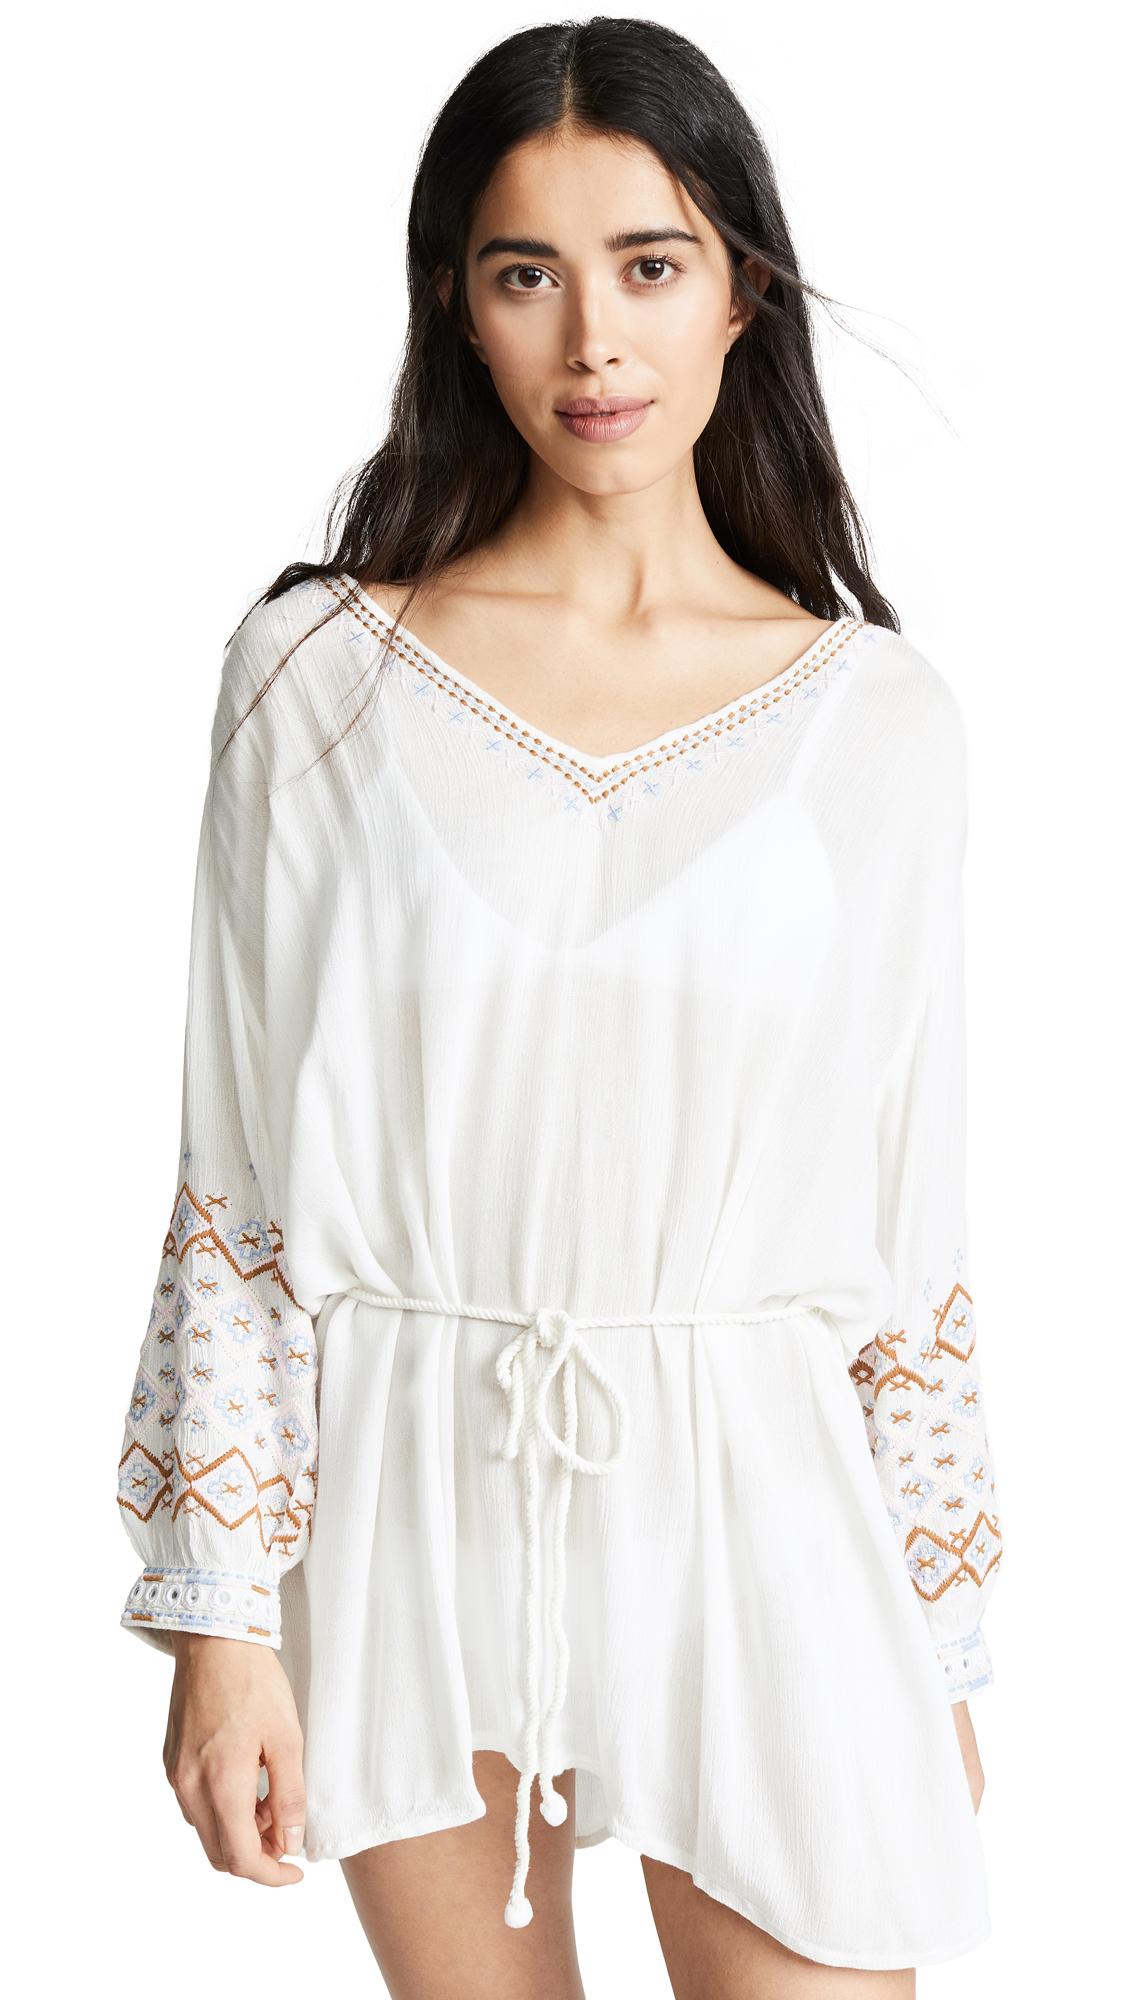 ONDADEMAR Crinkled Tunic in White